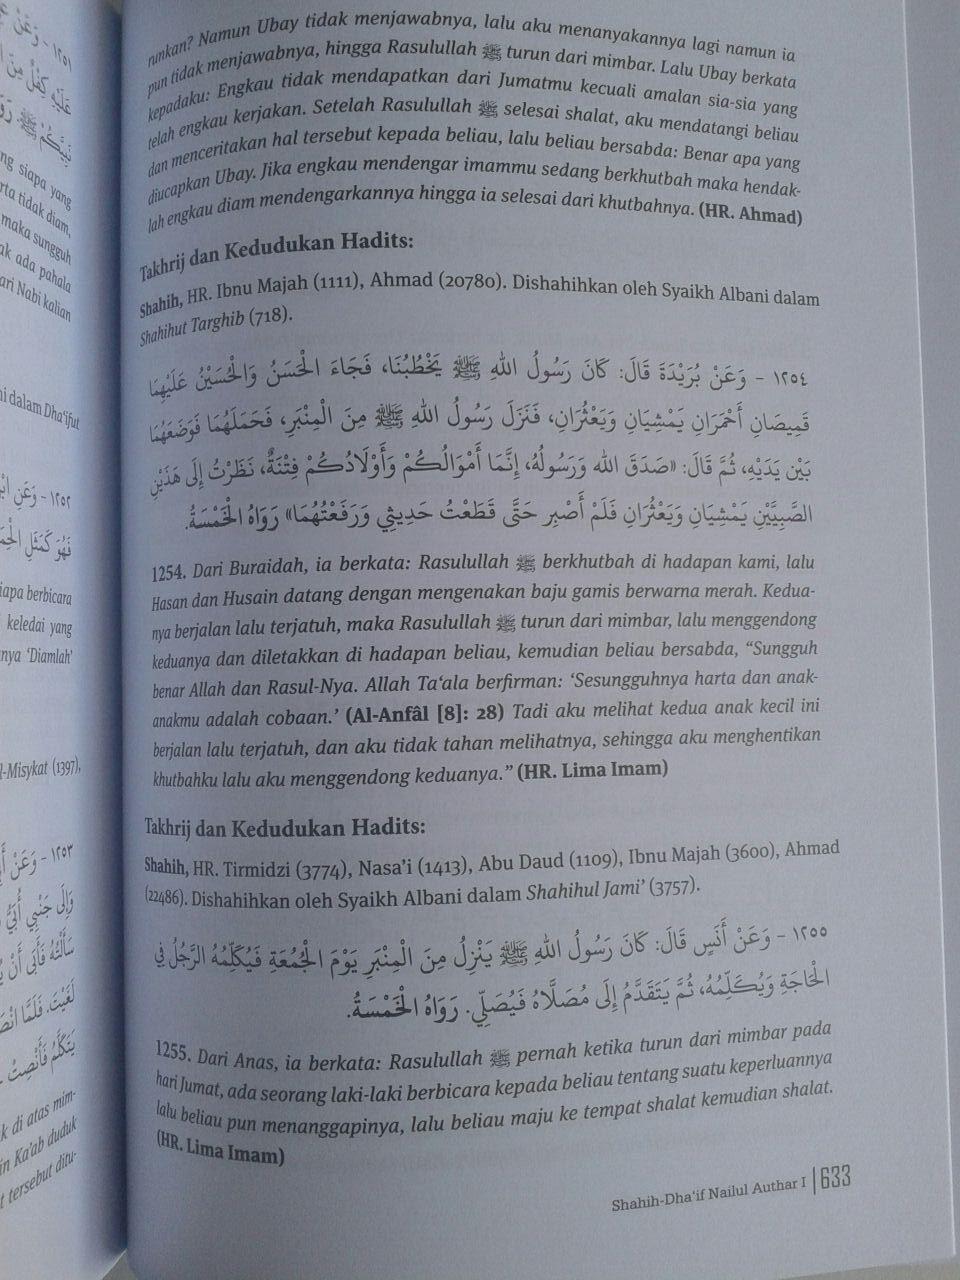 Buku Shahih Dhaif Nailul Authar Kumpulan Hadits Hukum Terlengkap isi